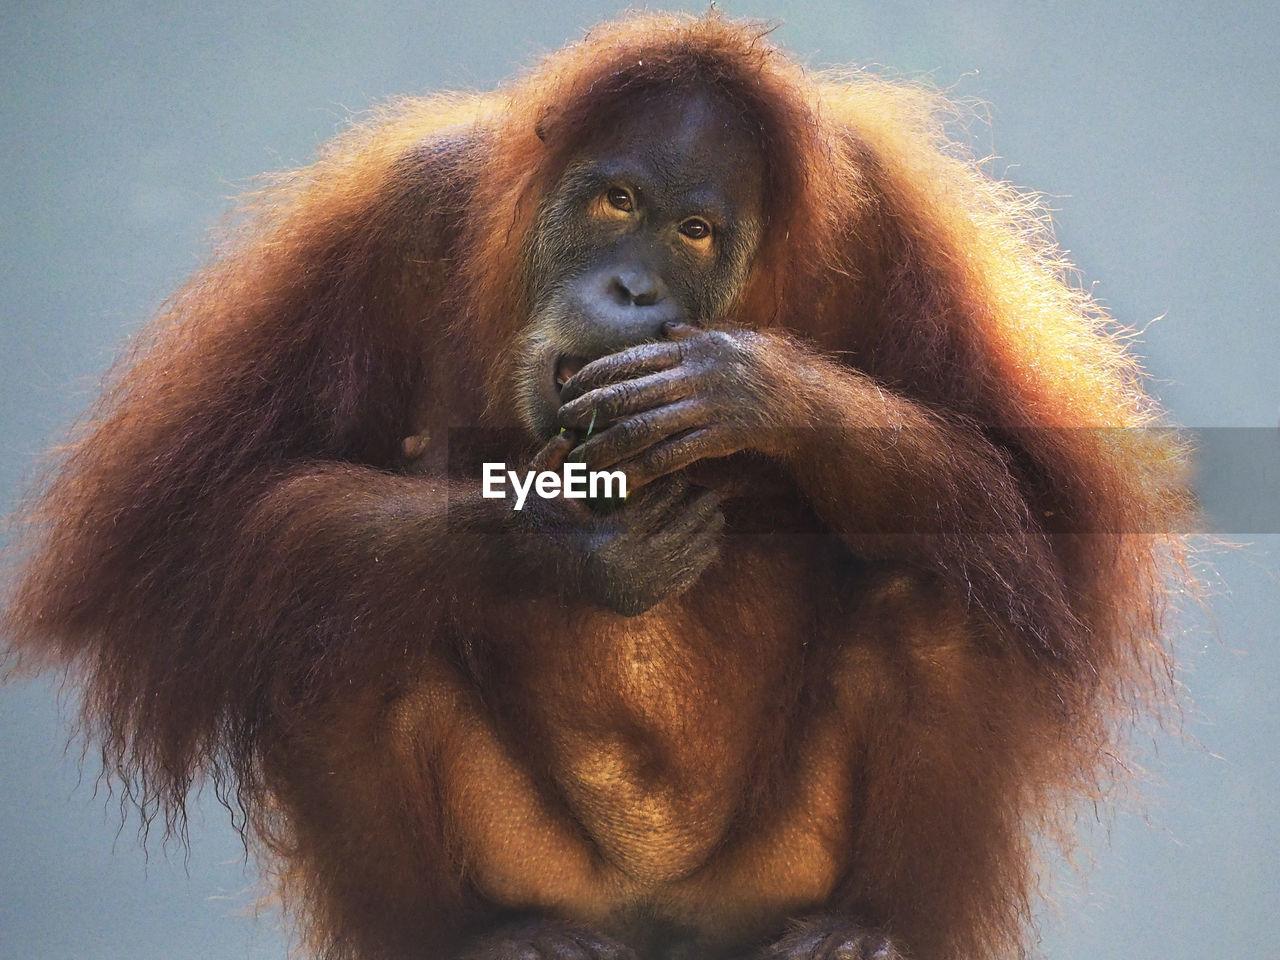 primate, monkey, animal, mammal, ape, animal wildlife, animal themes, one animal, animals in the wild, vertebrate, portrait, close-up, no people, brown, front view, orangutan, looking, day, hair, looking at camera, animal head